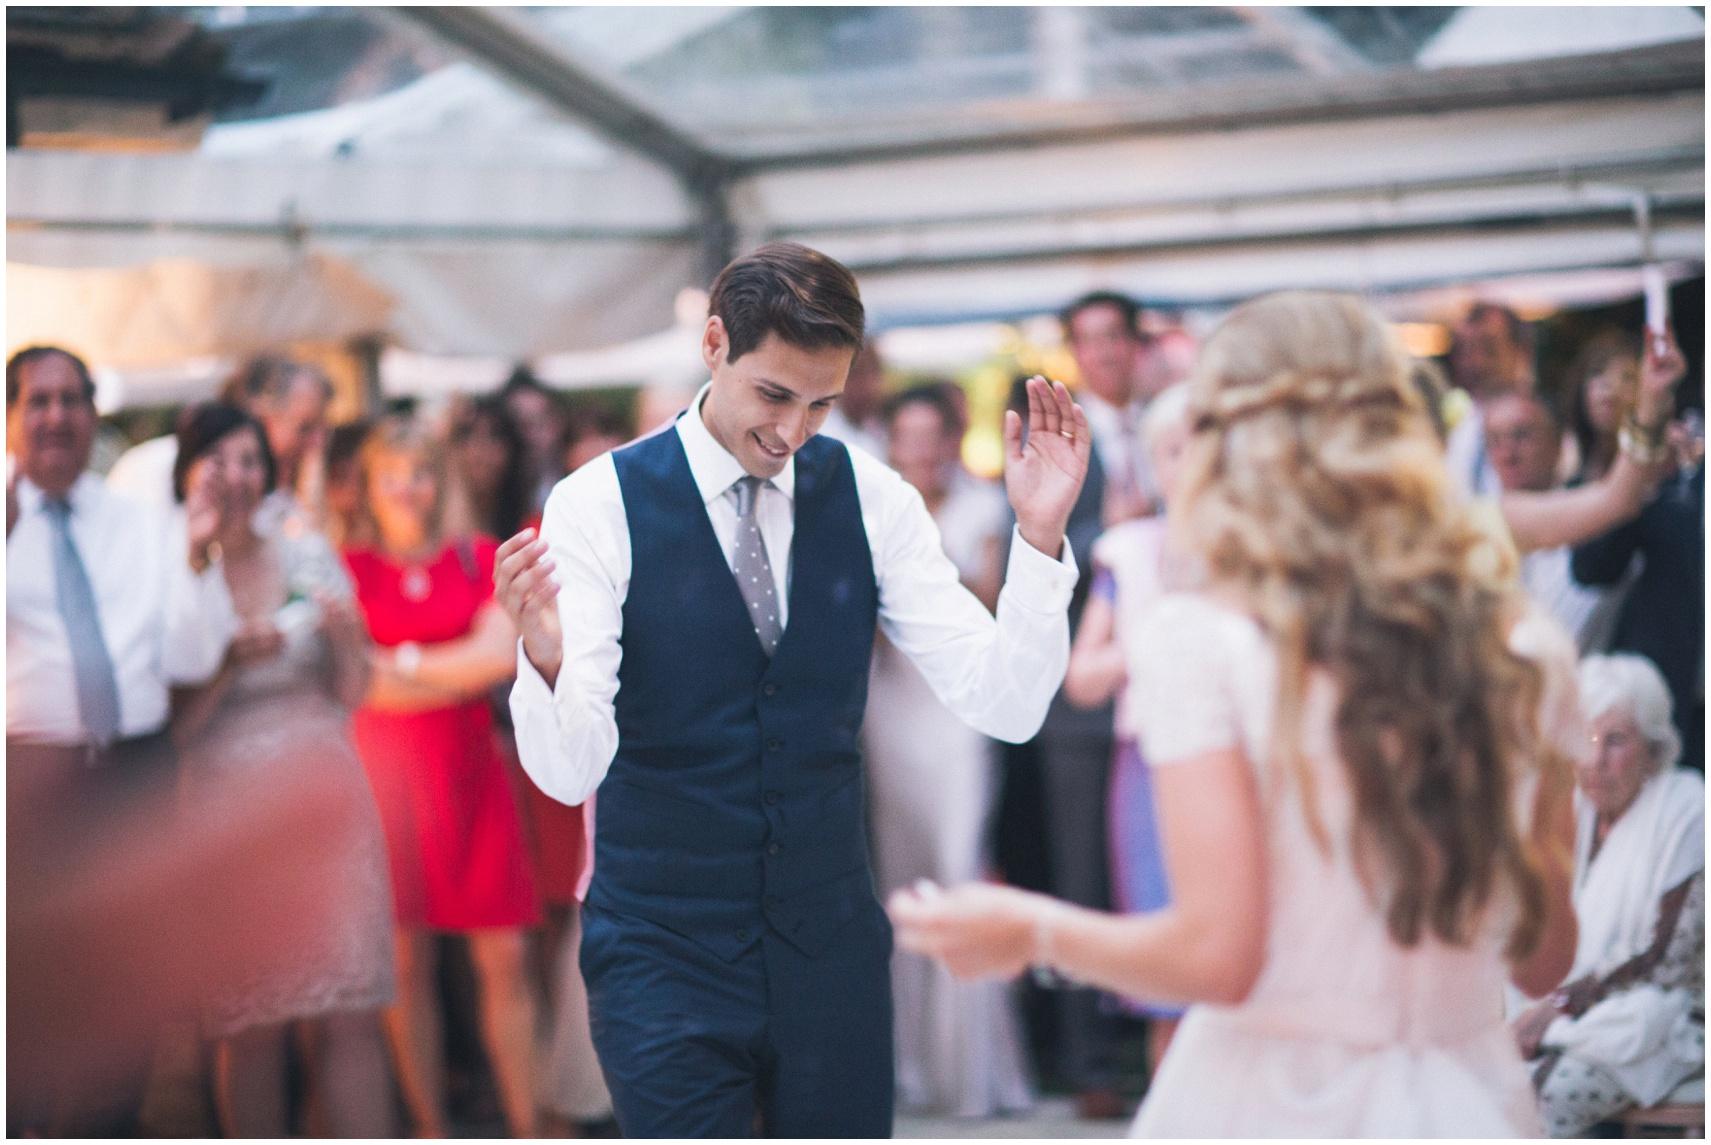 BMC Wedding photography Rutland_0355.jpg